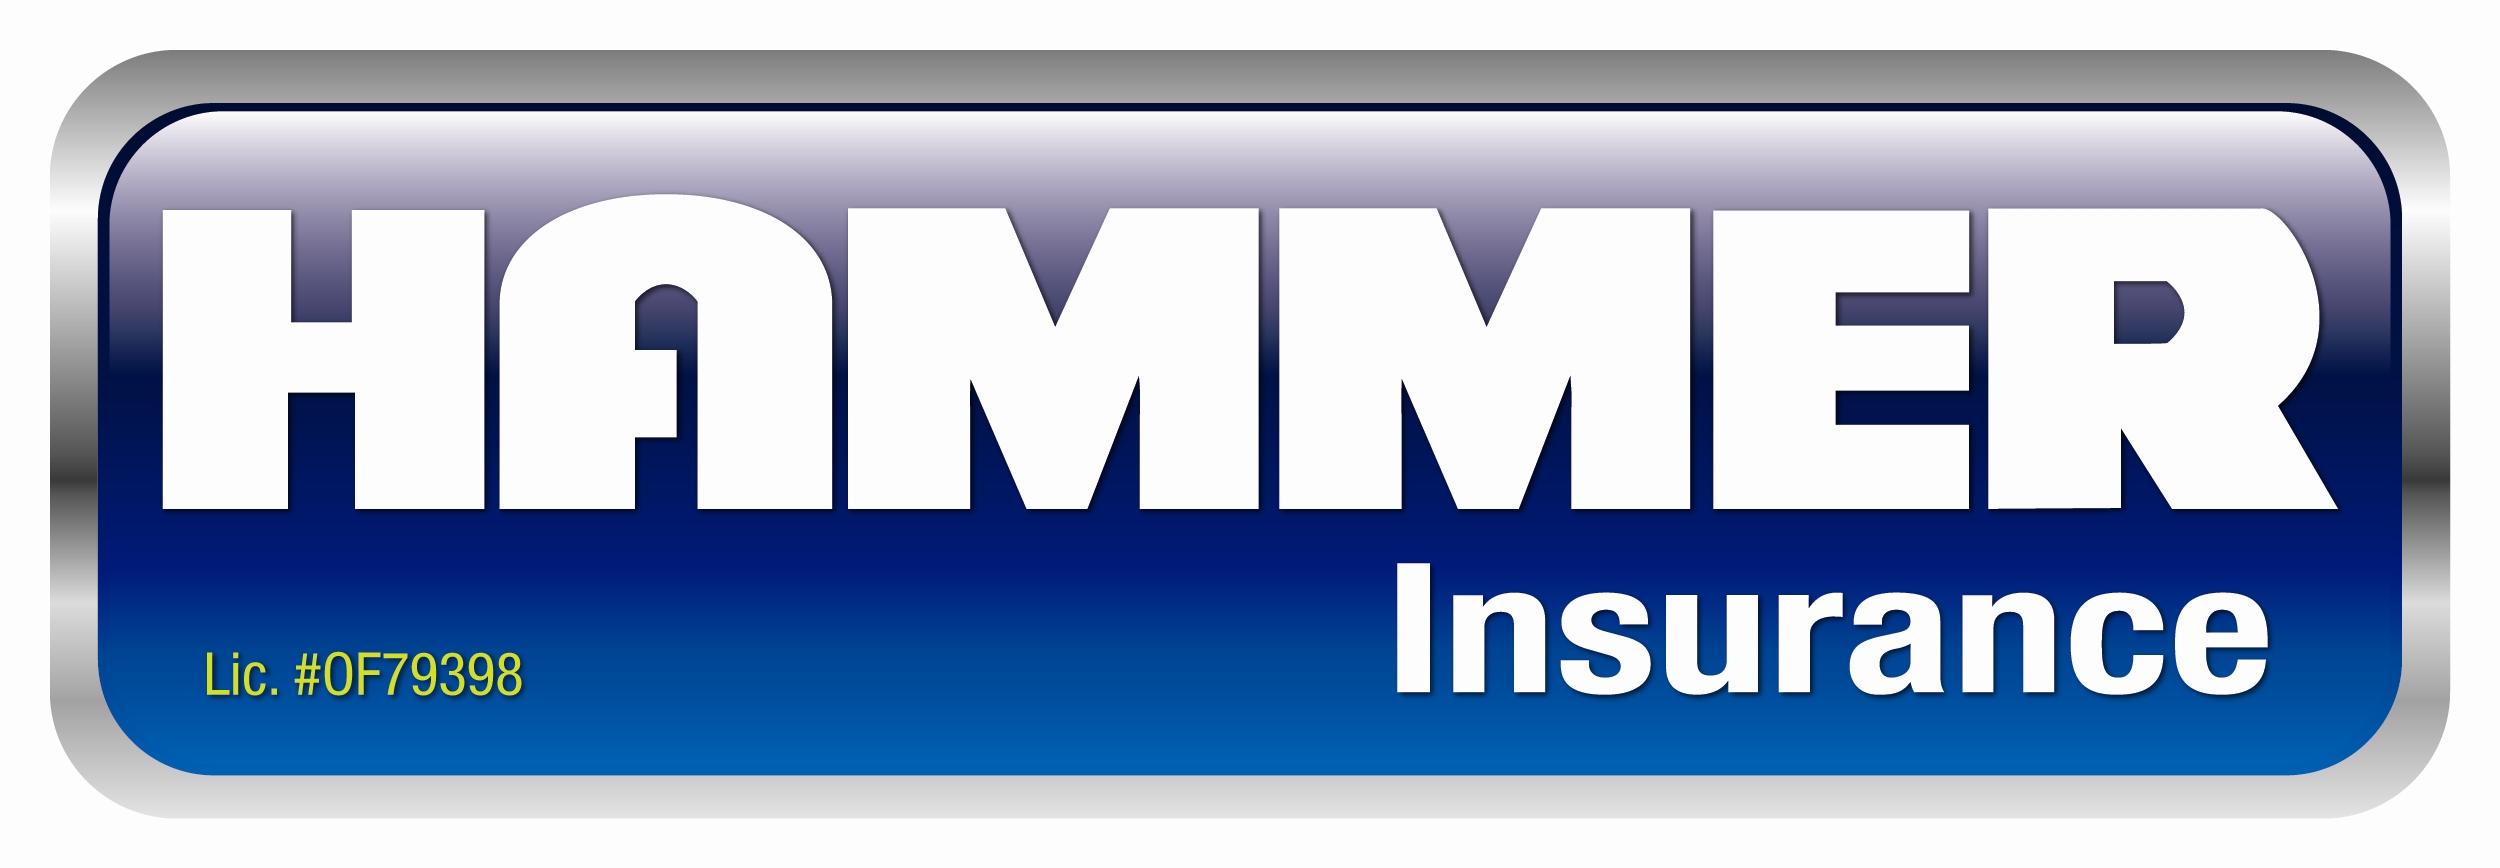 general driver insurance infinity service customer aim auto club